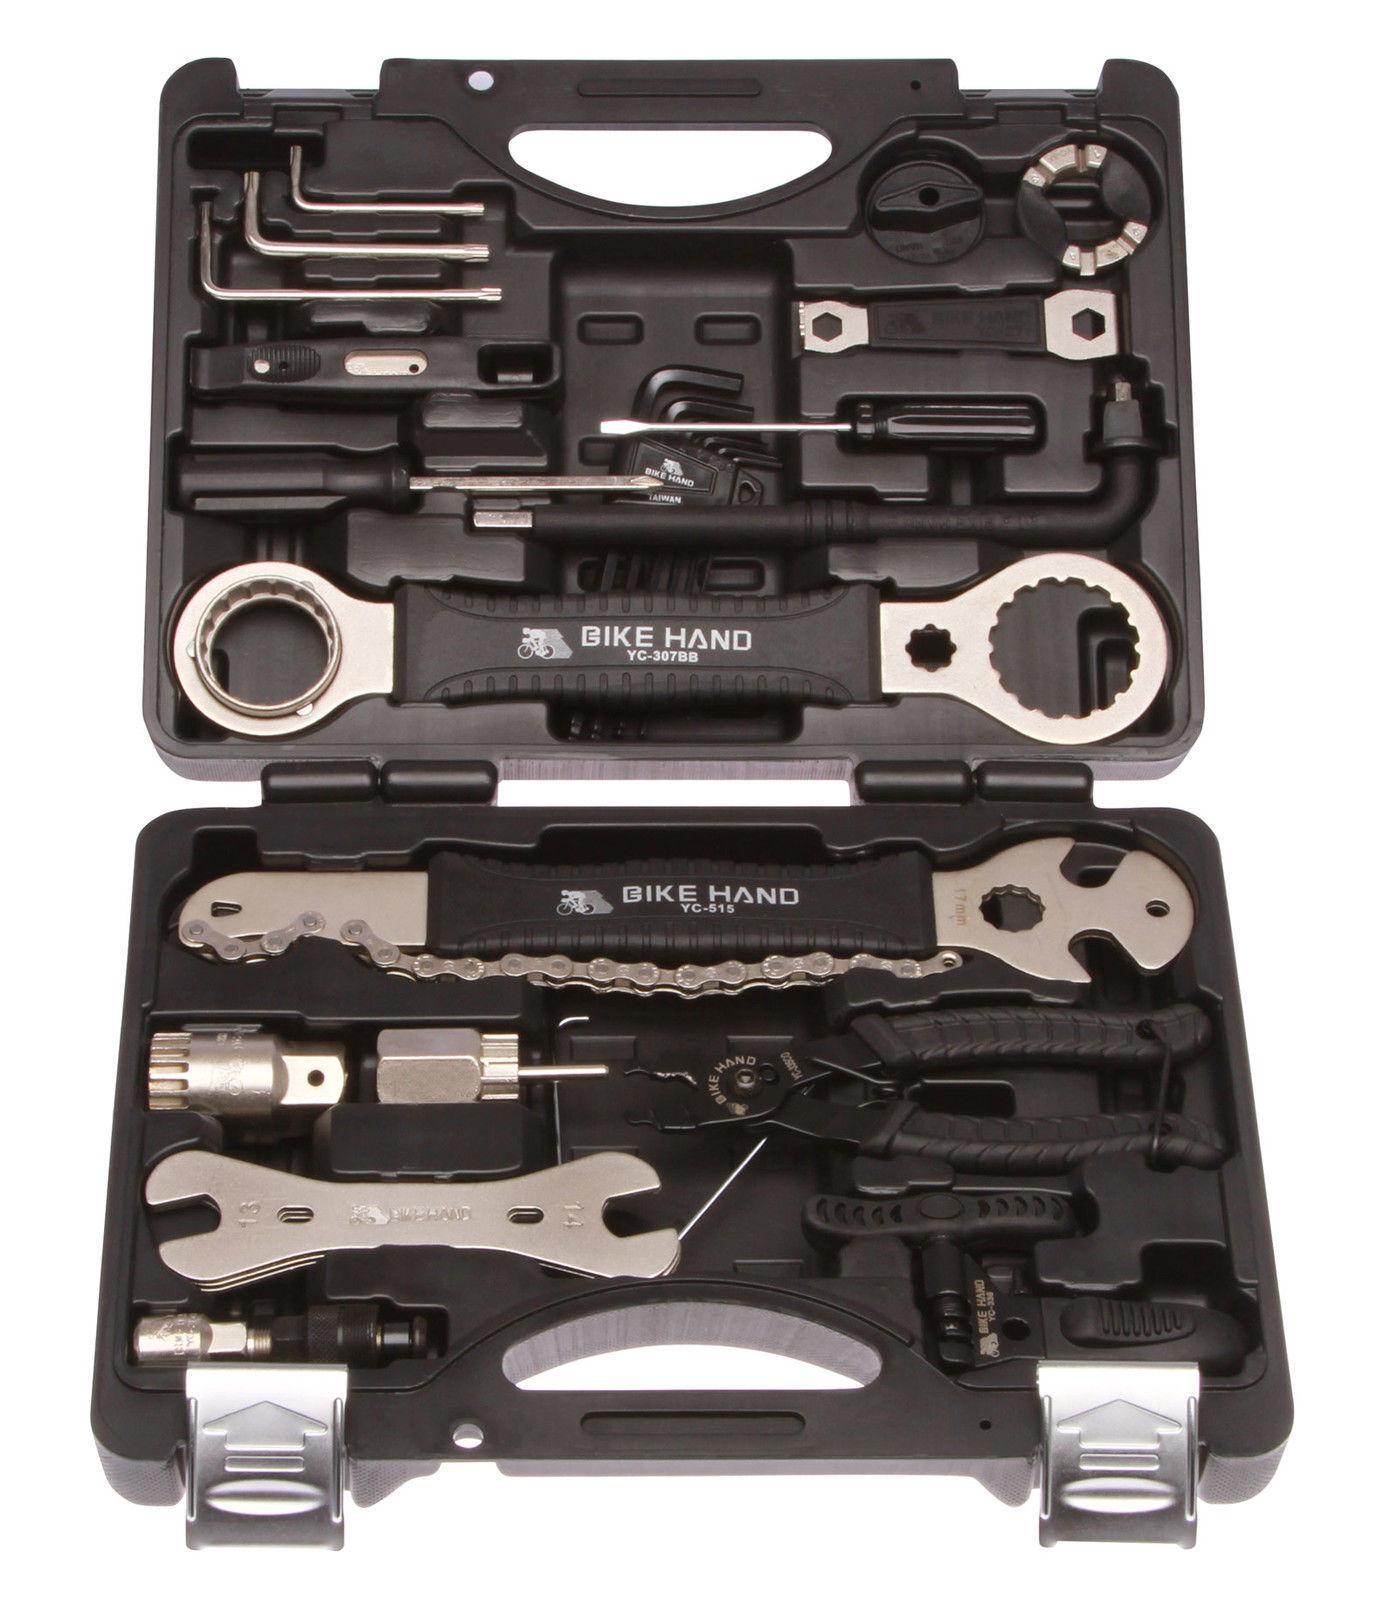 Profi Fahrrad Fahrrad Fahrrad Werkzeug Koffer Reparatur Service Rad Werkzeugkoffer Shimano use d95c8e